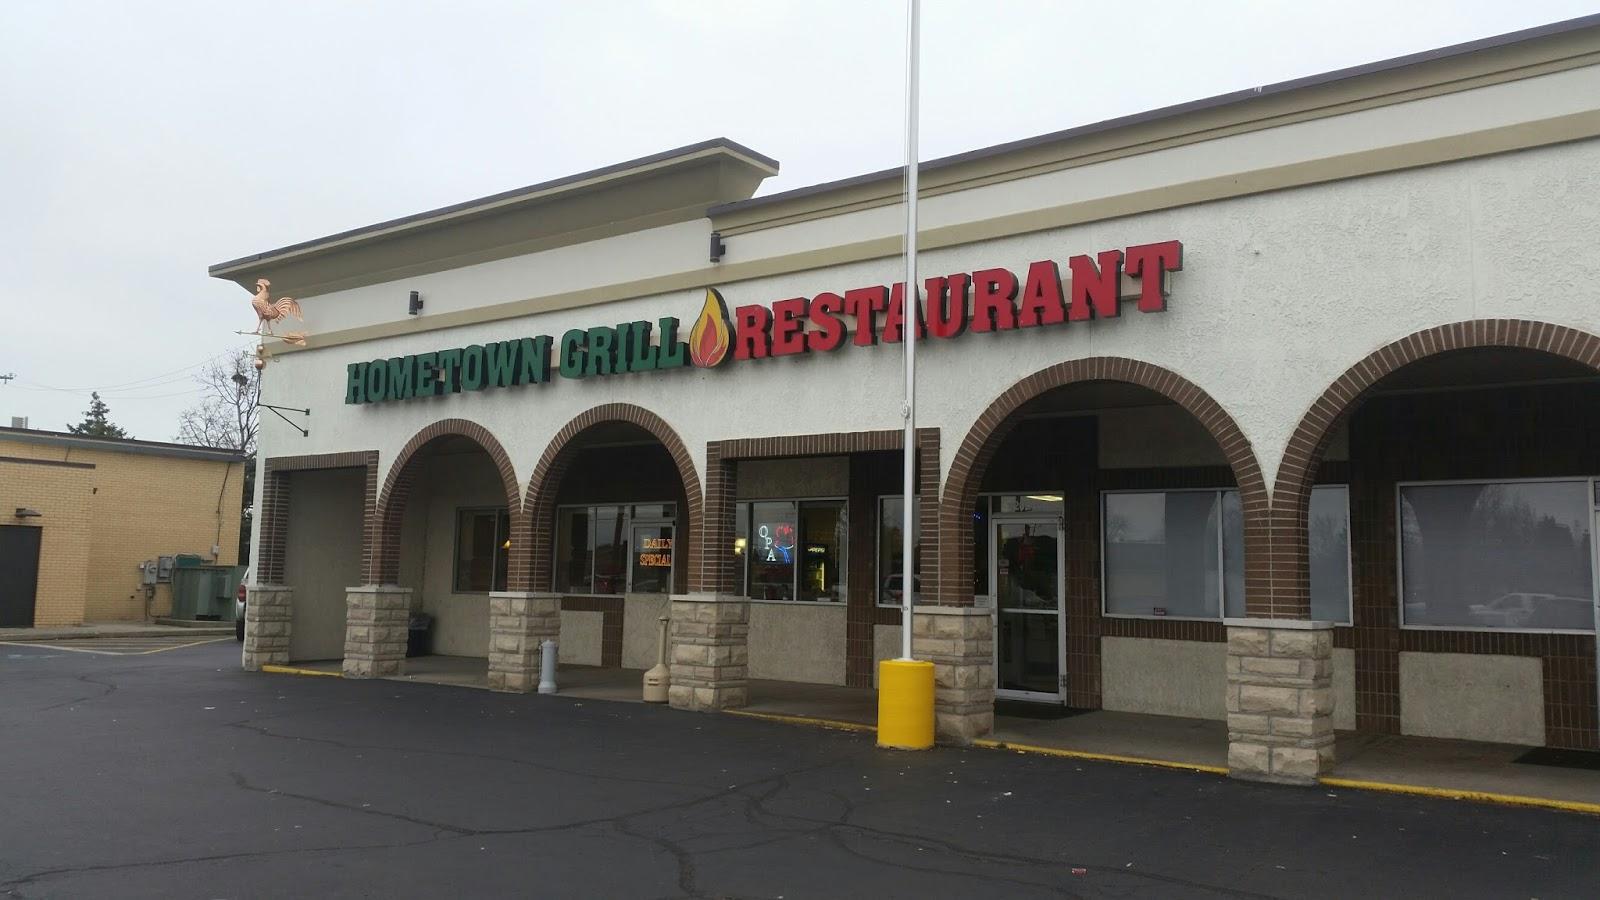 HomeTown Grill Restaurant in Clinton Township, Michigan